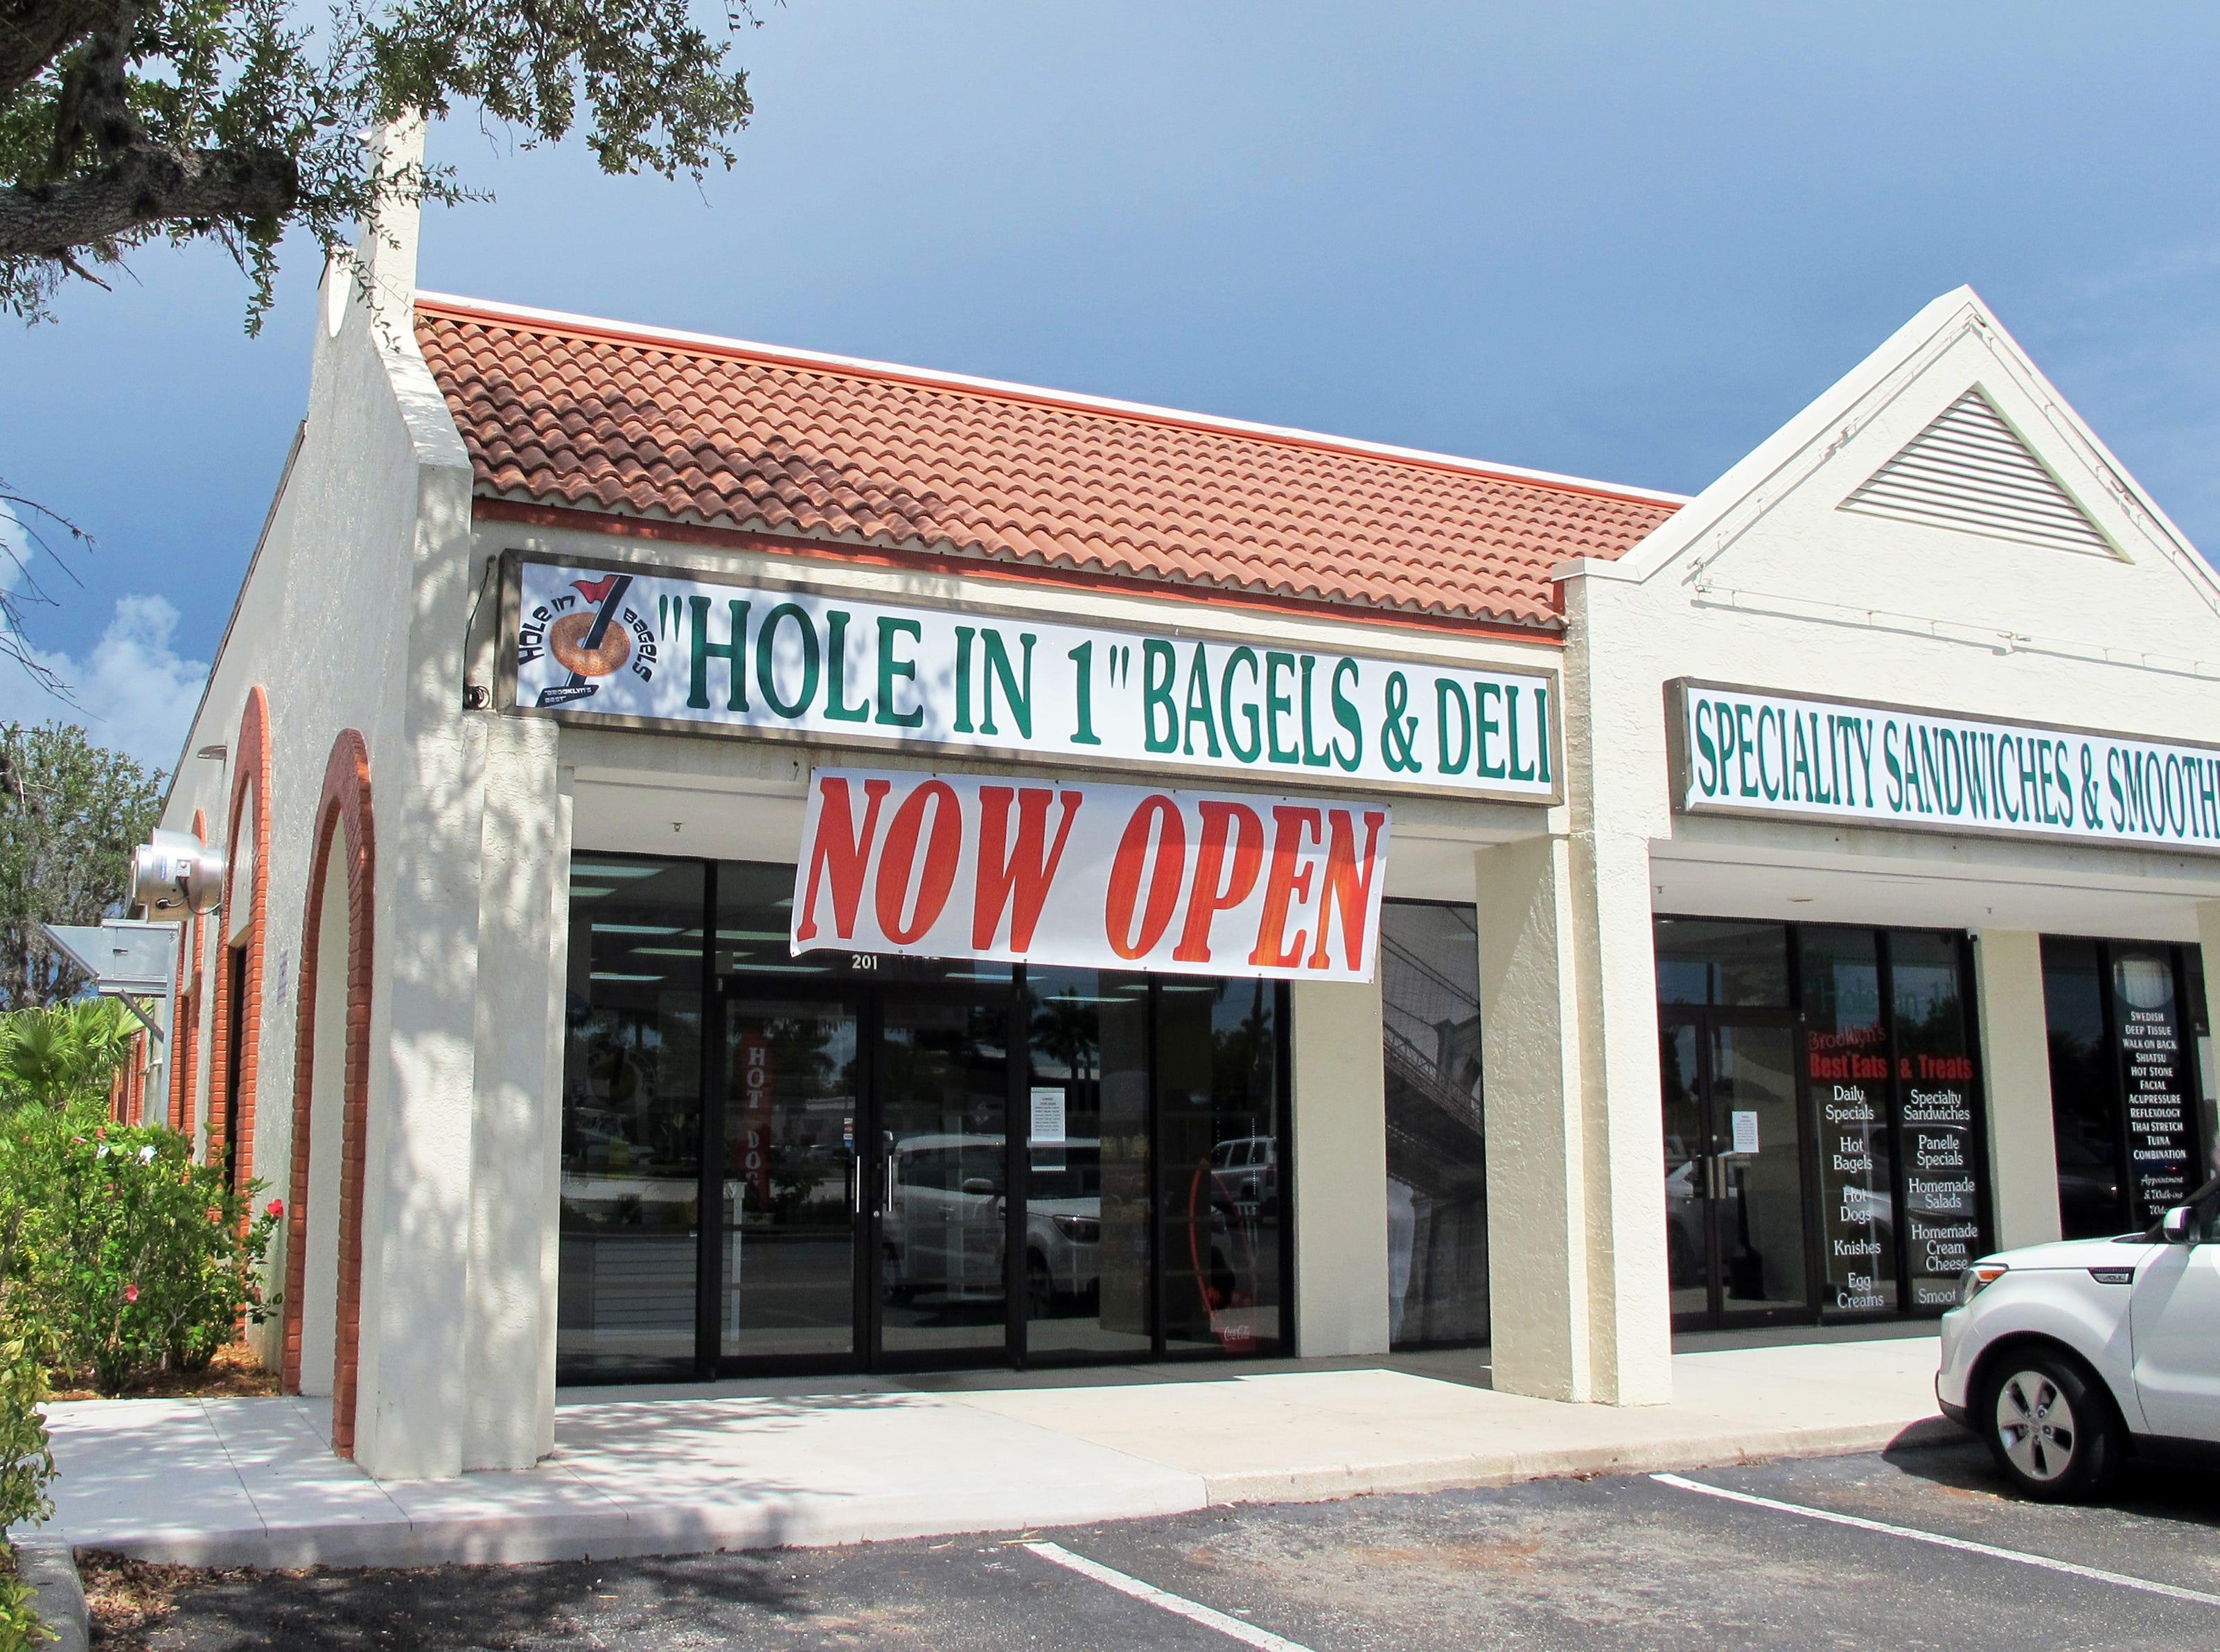 Hole in 1 Bagels & Deli opened in June 2018 in the former Radio Shack store on U.S. 41 south of Bonita Beach Road in Bonita Springs.